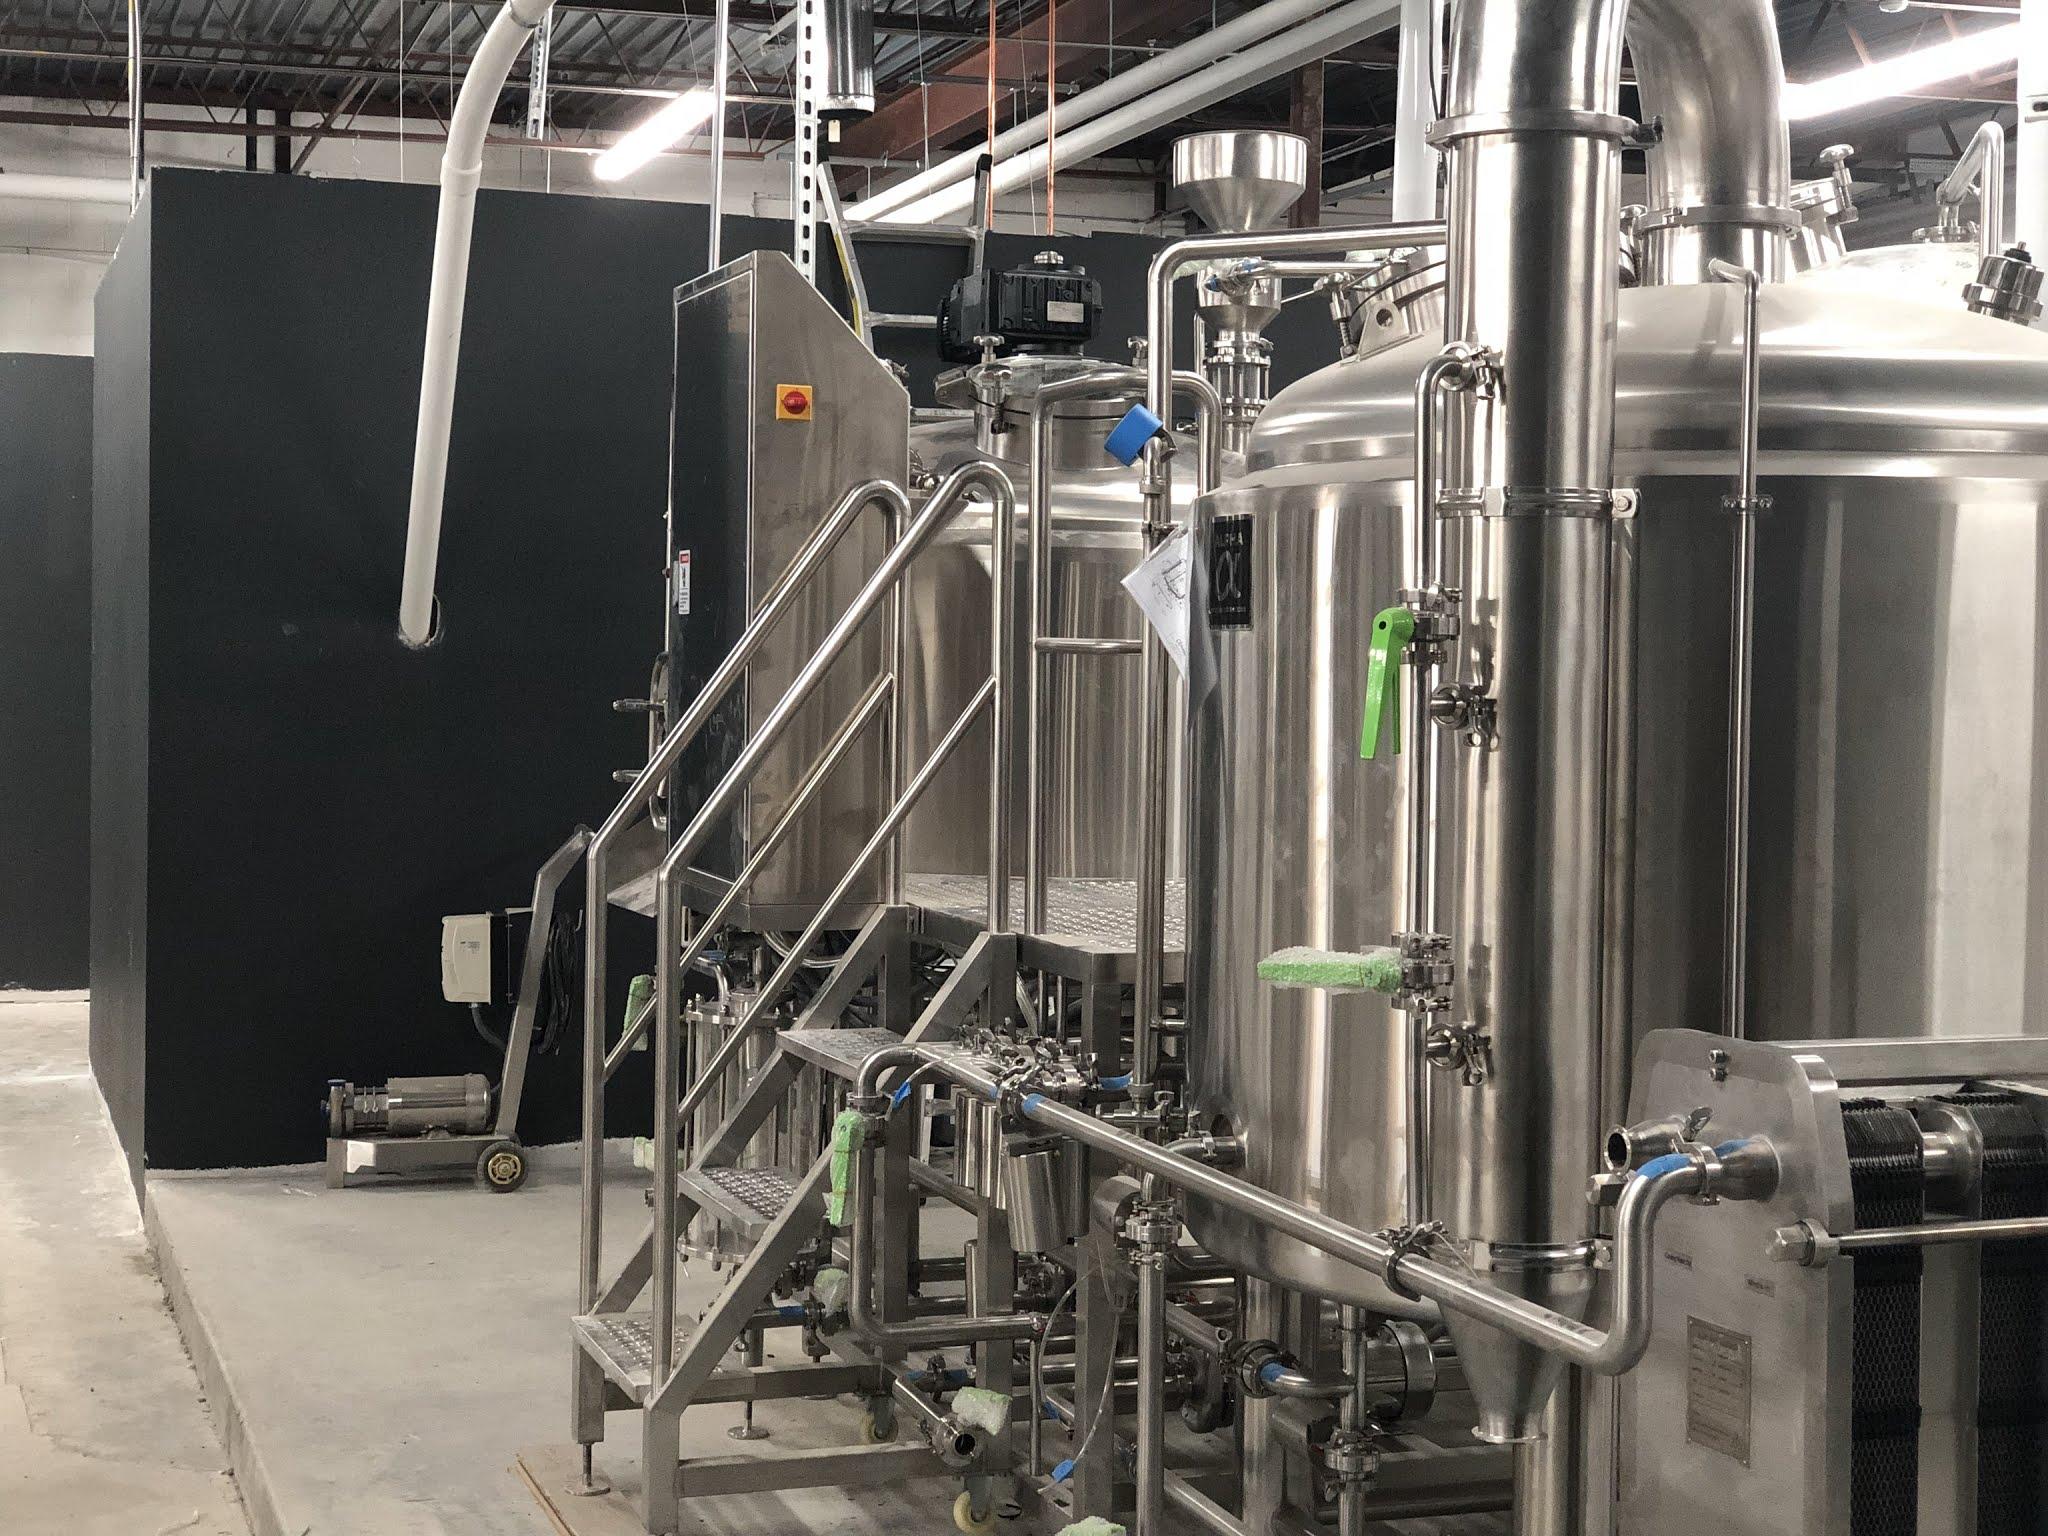 Olentangy_River_Brewing_Brewery.jpg